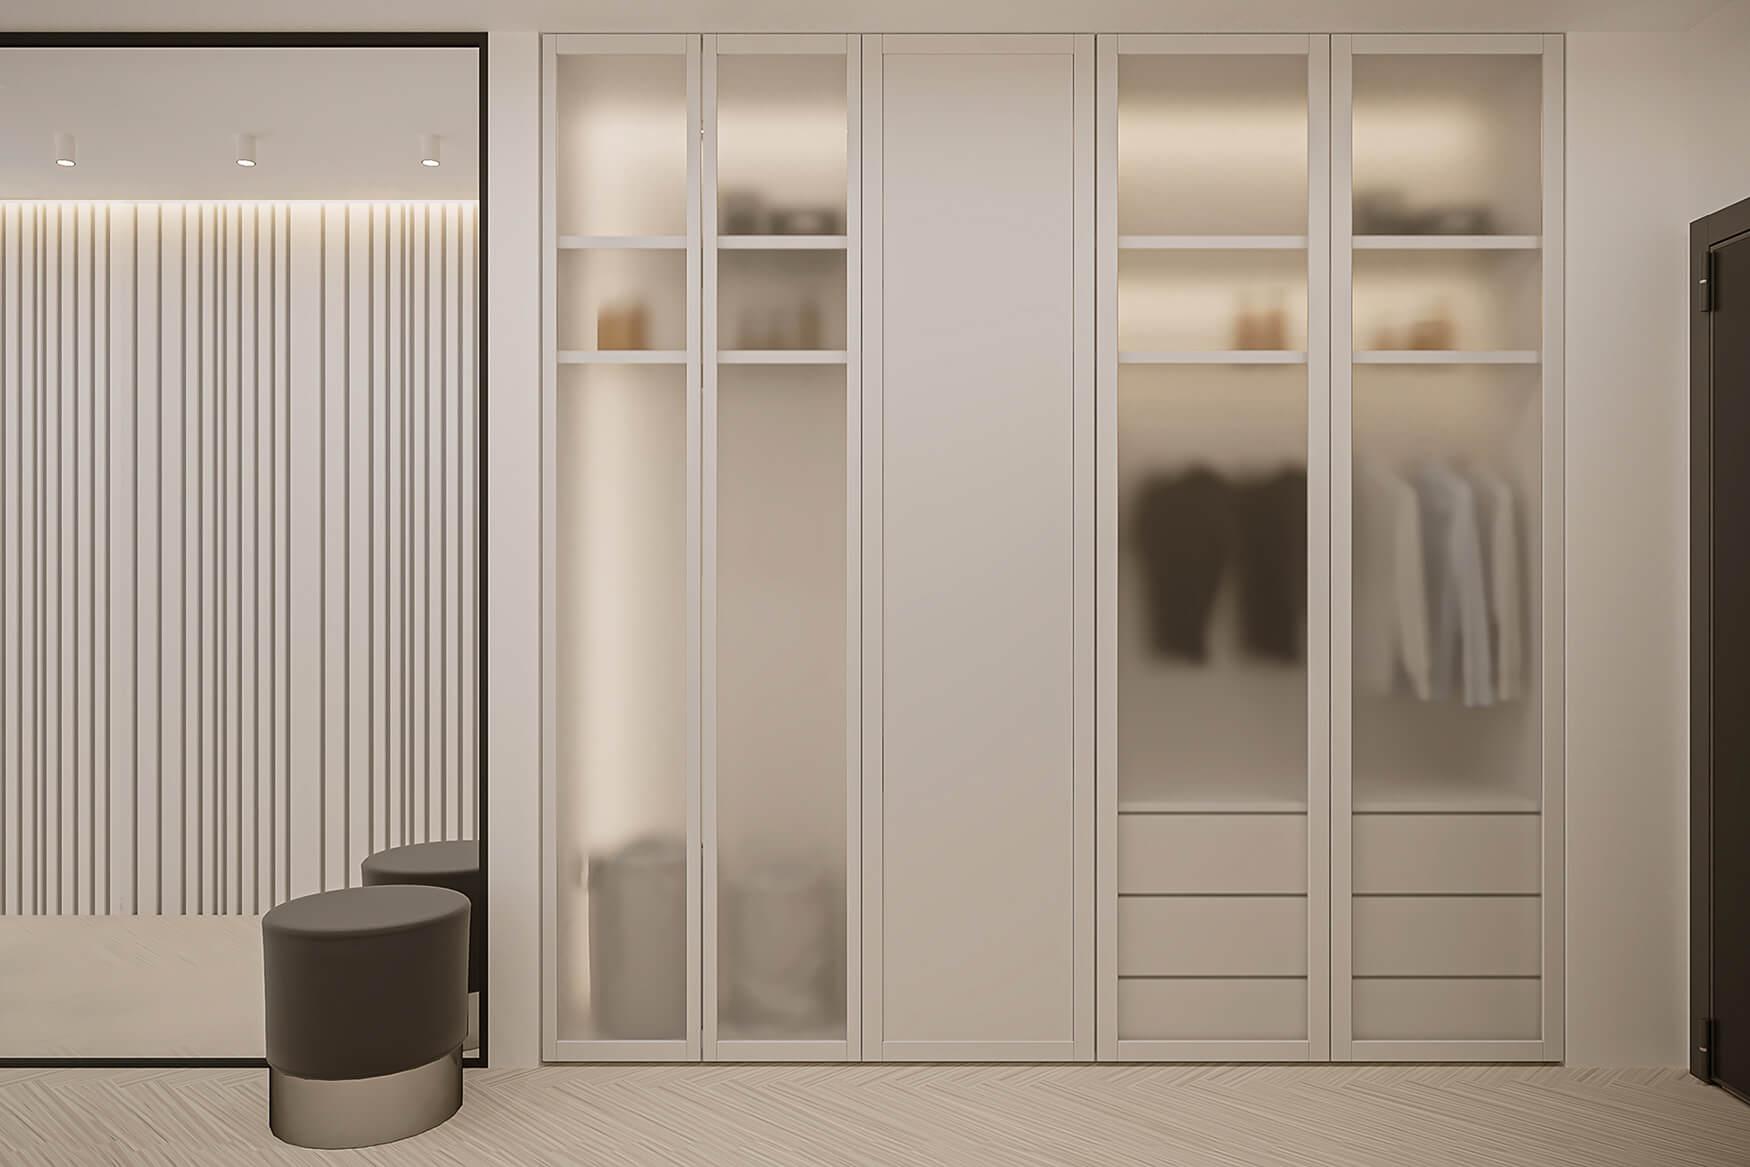 interioren-dizain-proekt-na-koridor-s-antre